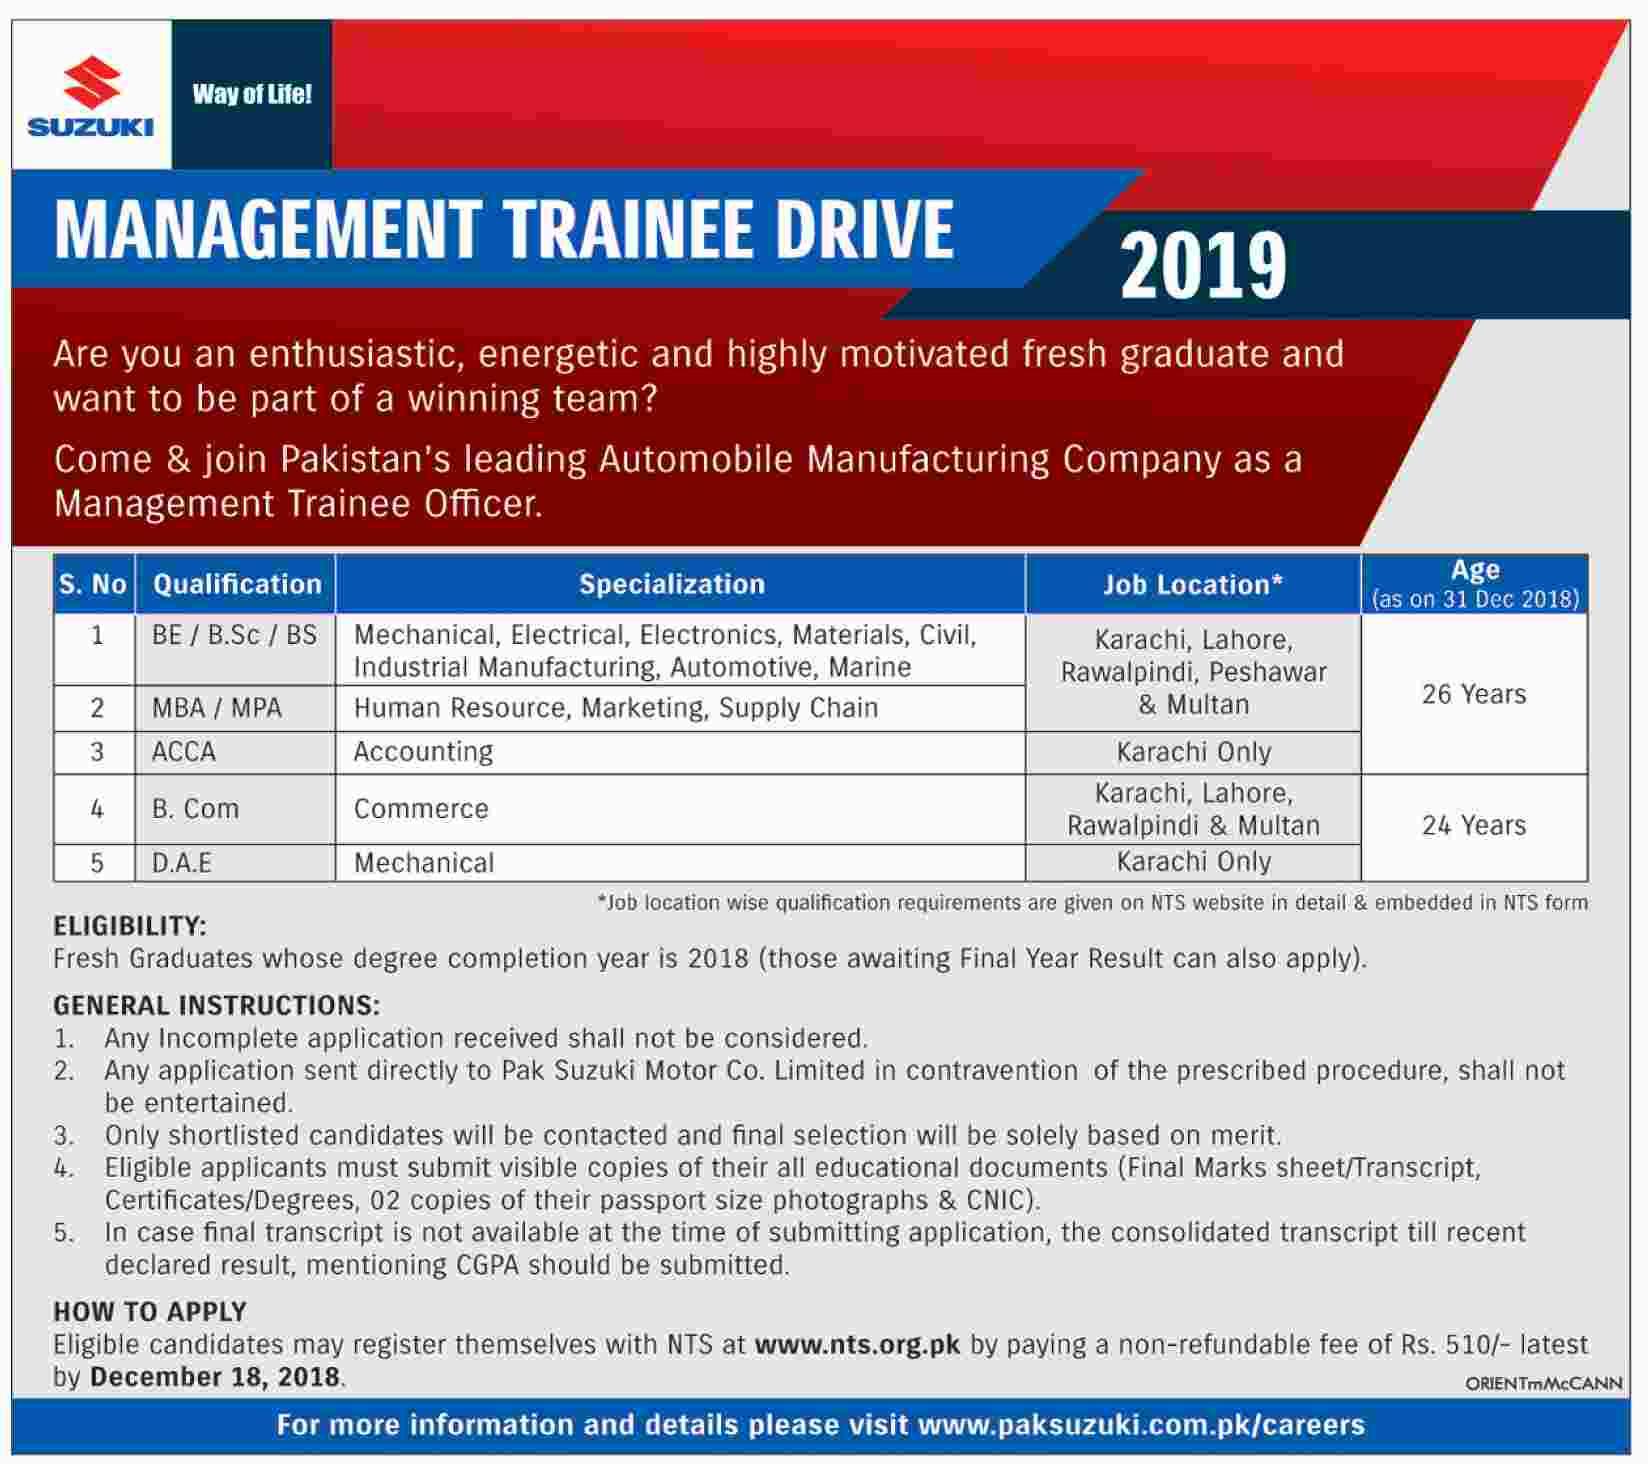 Pak Suzuki Management Trainee Program 2019